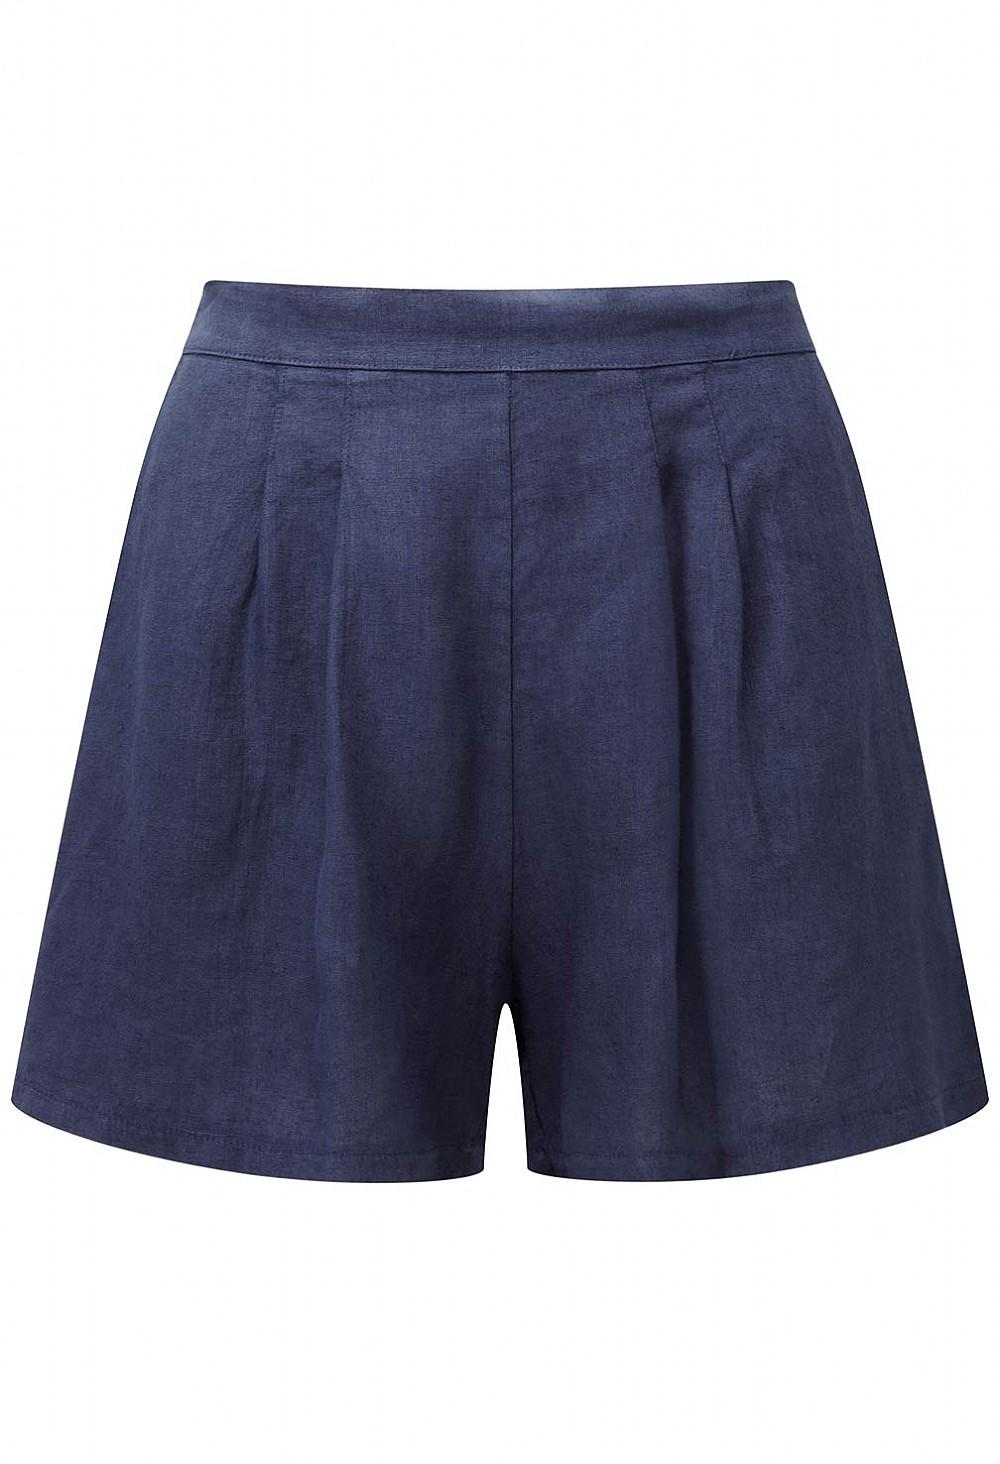 Anguilla Linen Rio Shorts